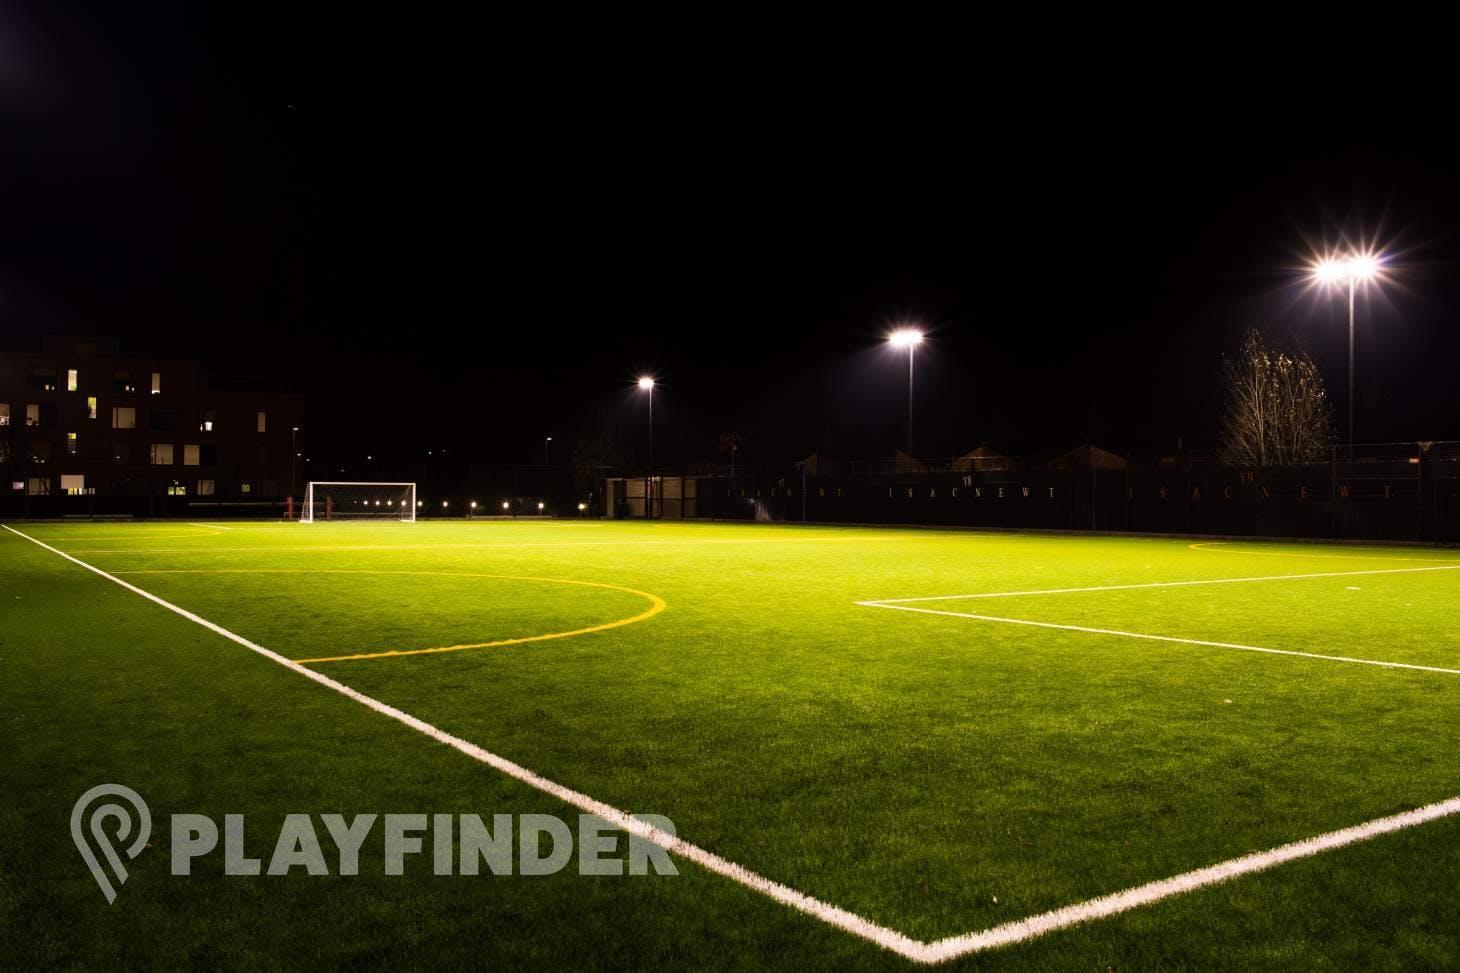 Isaac Newton Academy 7 a side | 3G Astroturf football pitch